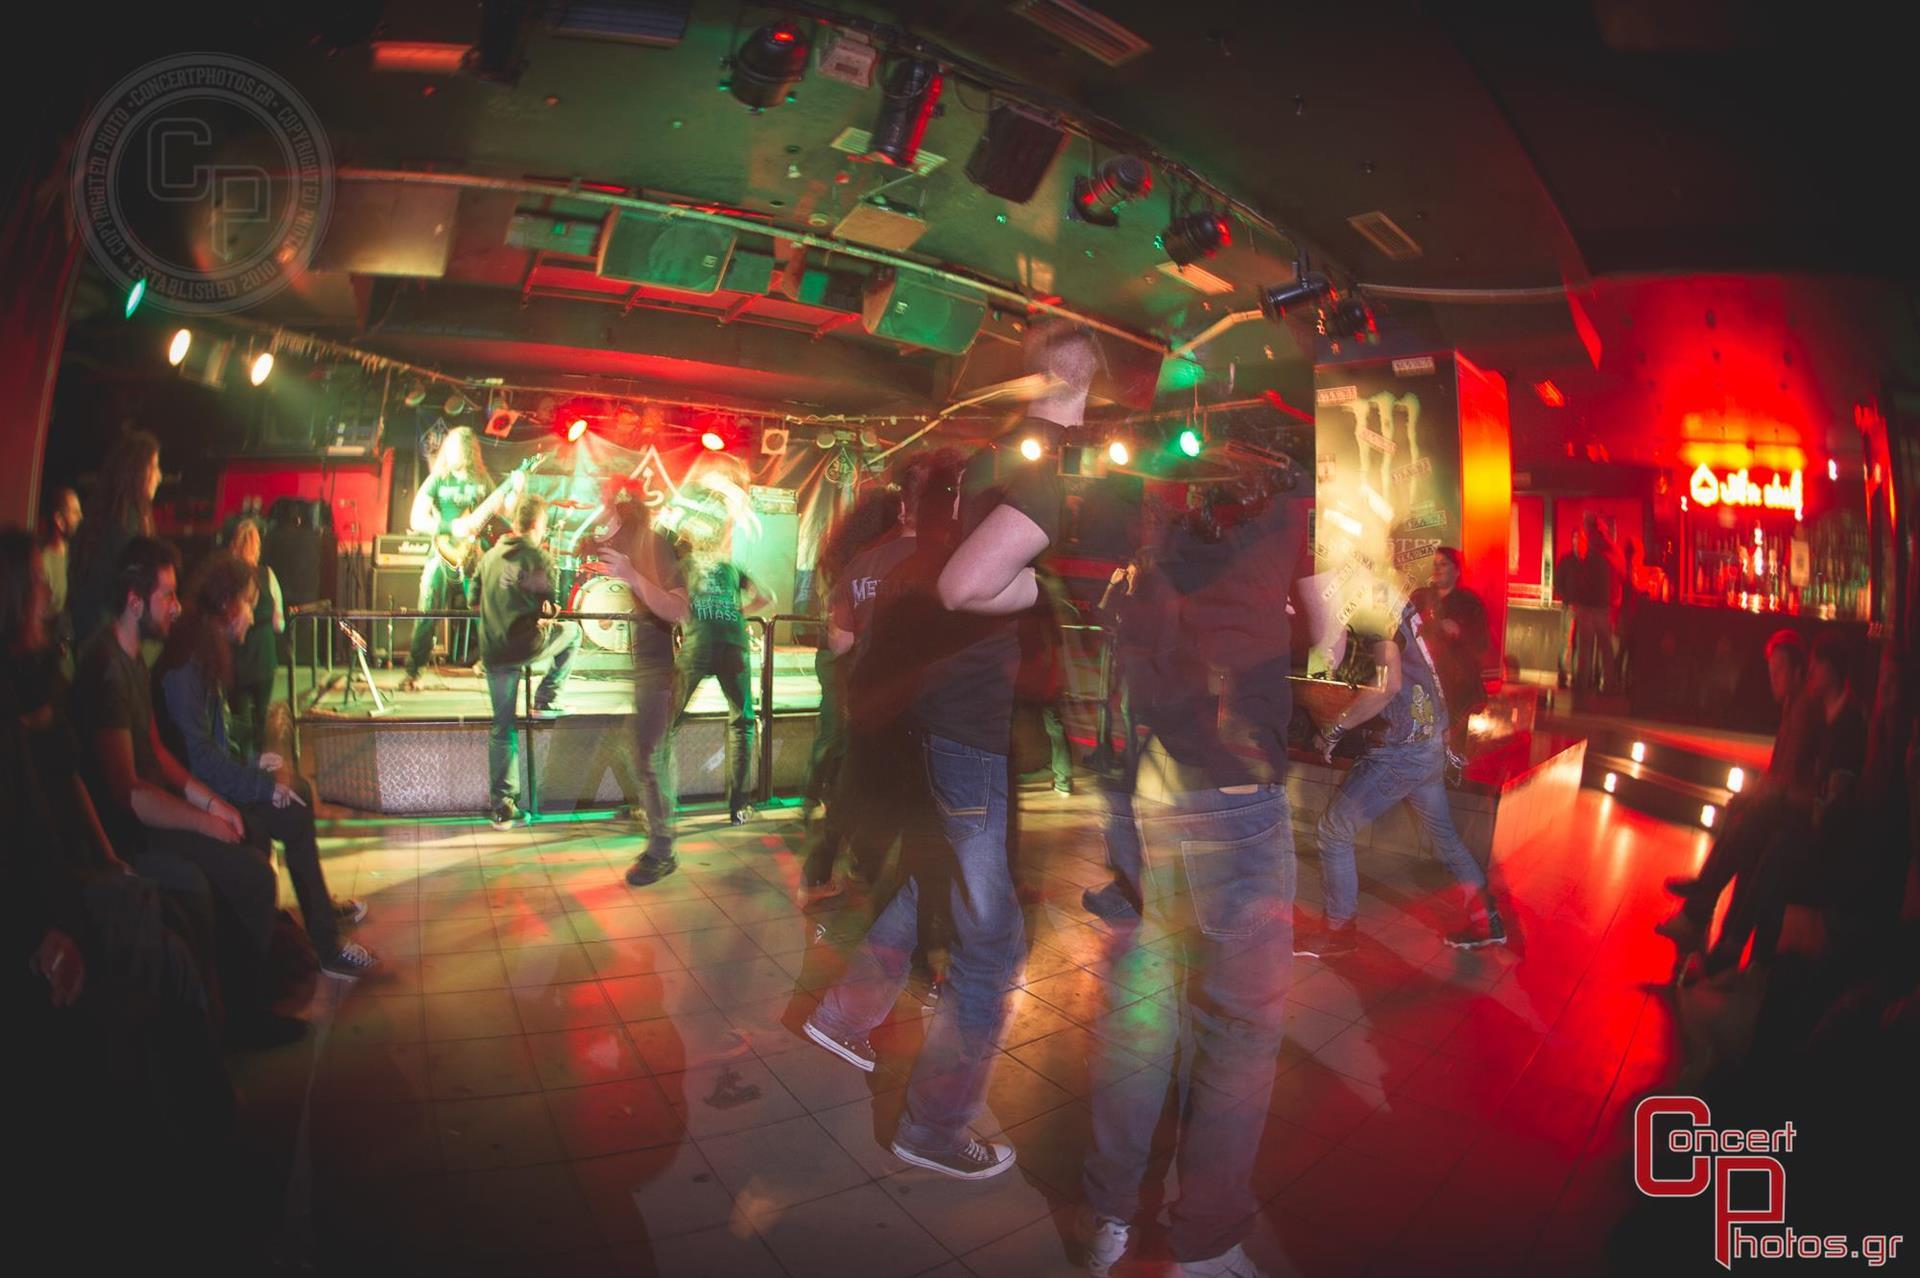 Battle Of The Bands Athens - Leg 3- photographer:  - ConcertPhotos - 20150104_2319_46